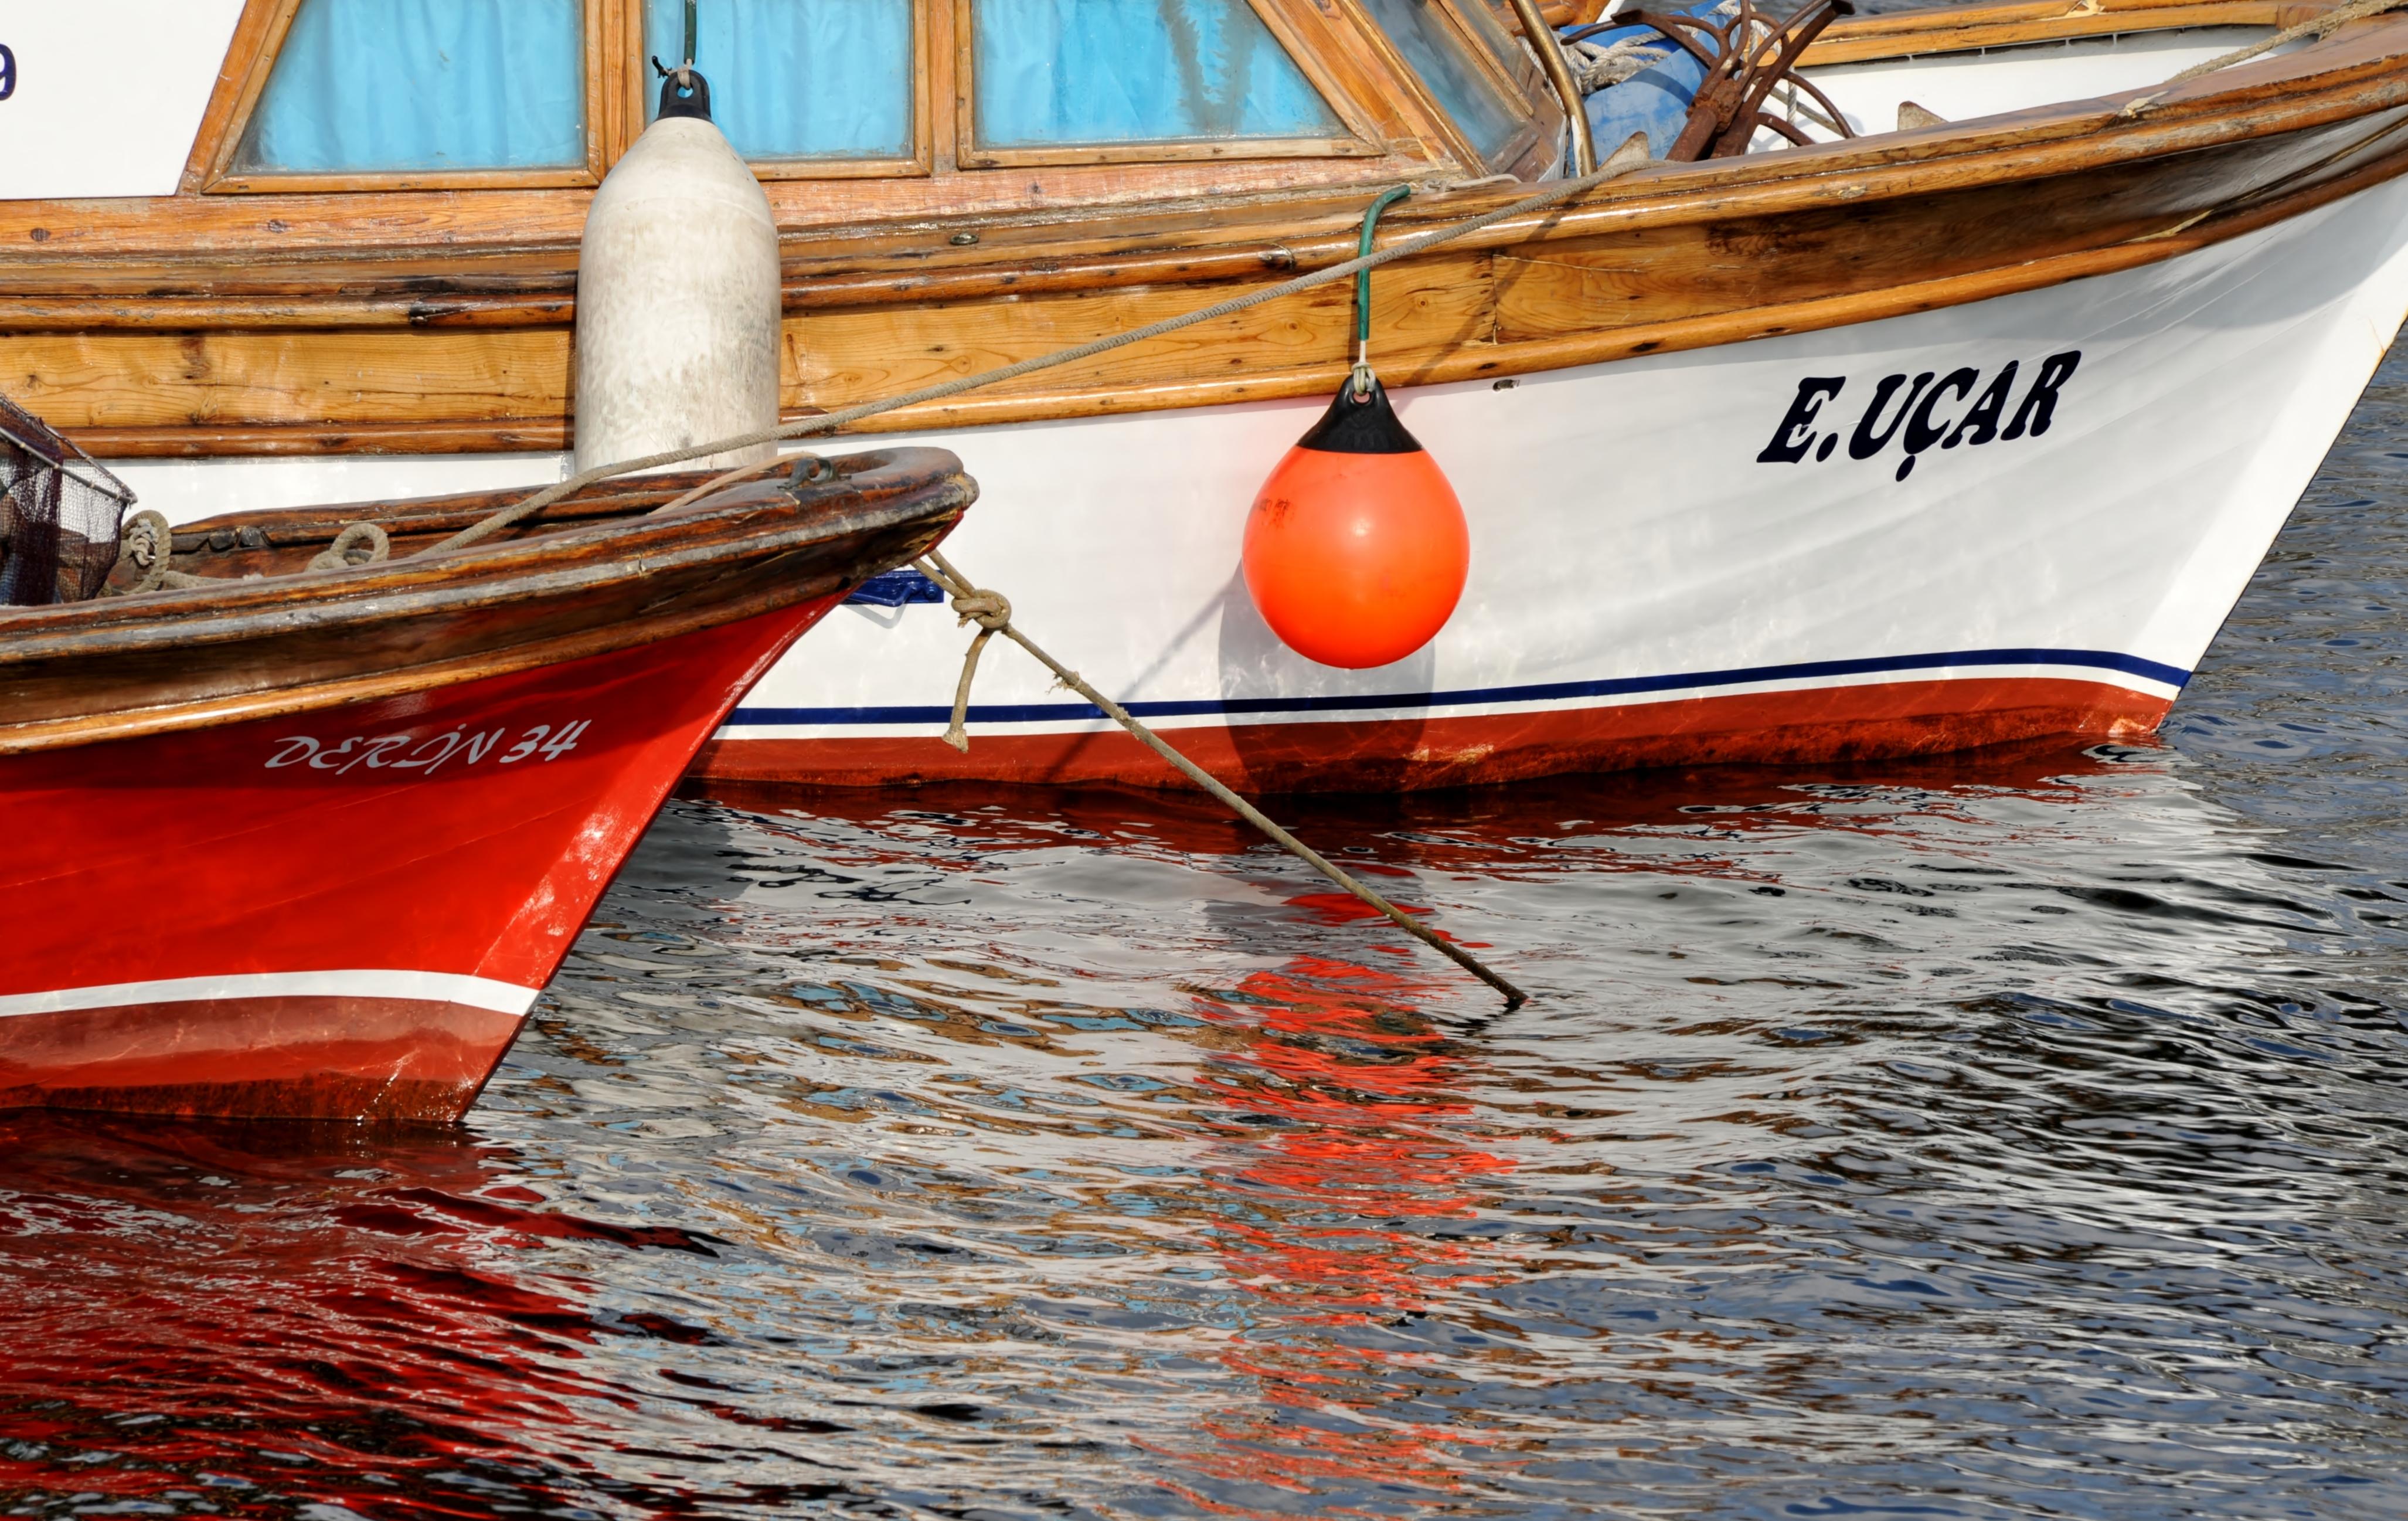 Boats, Fishing, Harbor, Ocean, Sea, HQ Photo